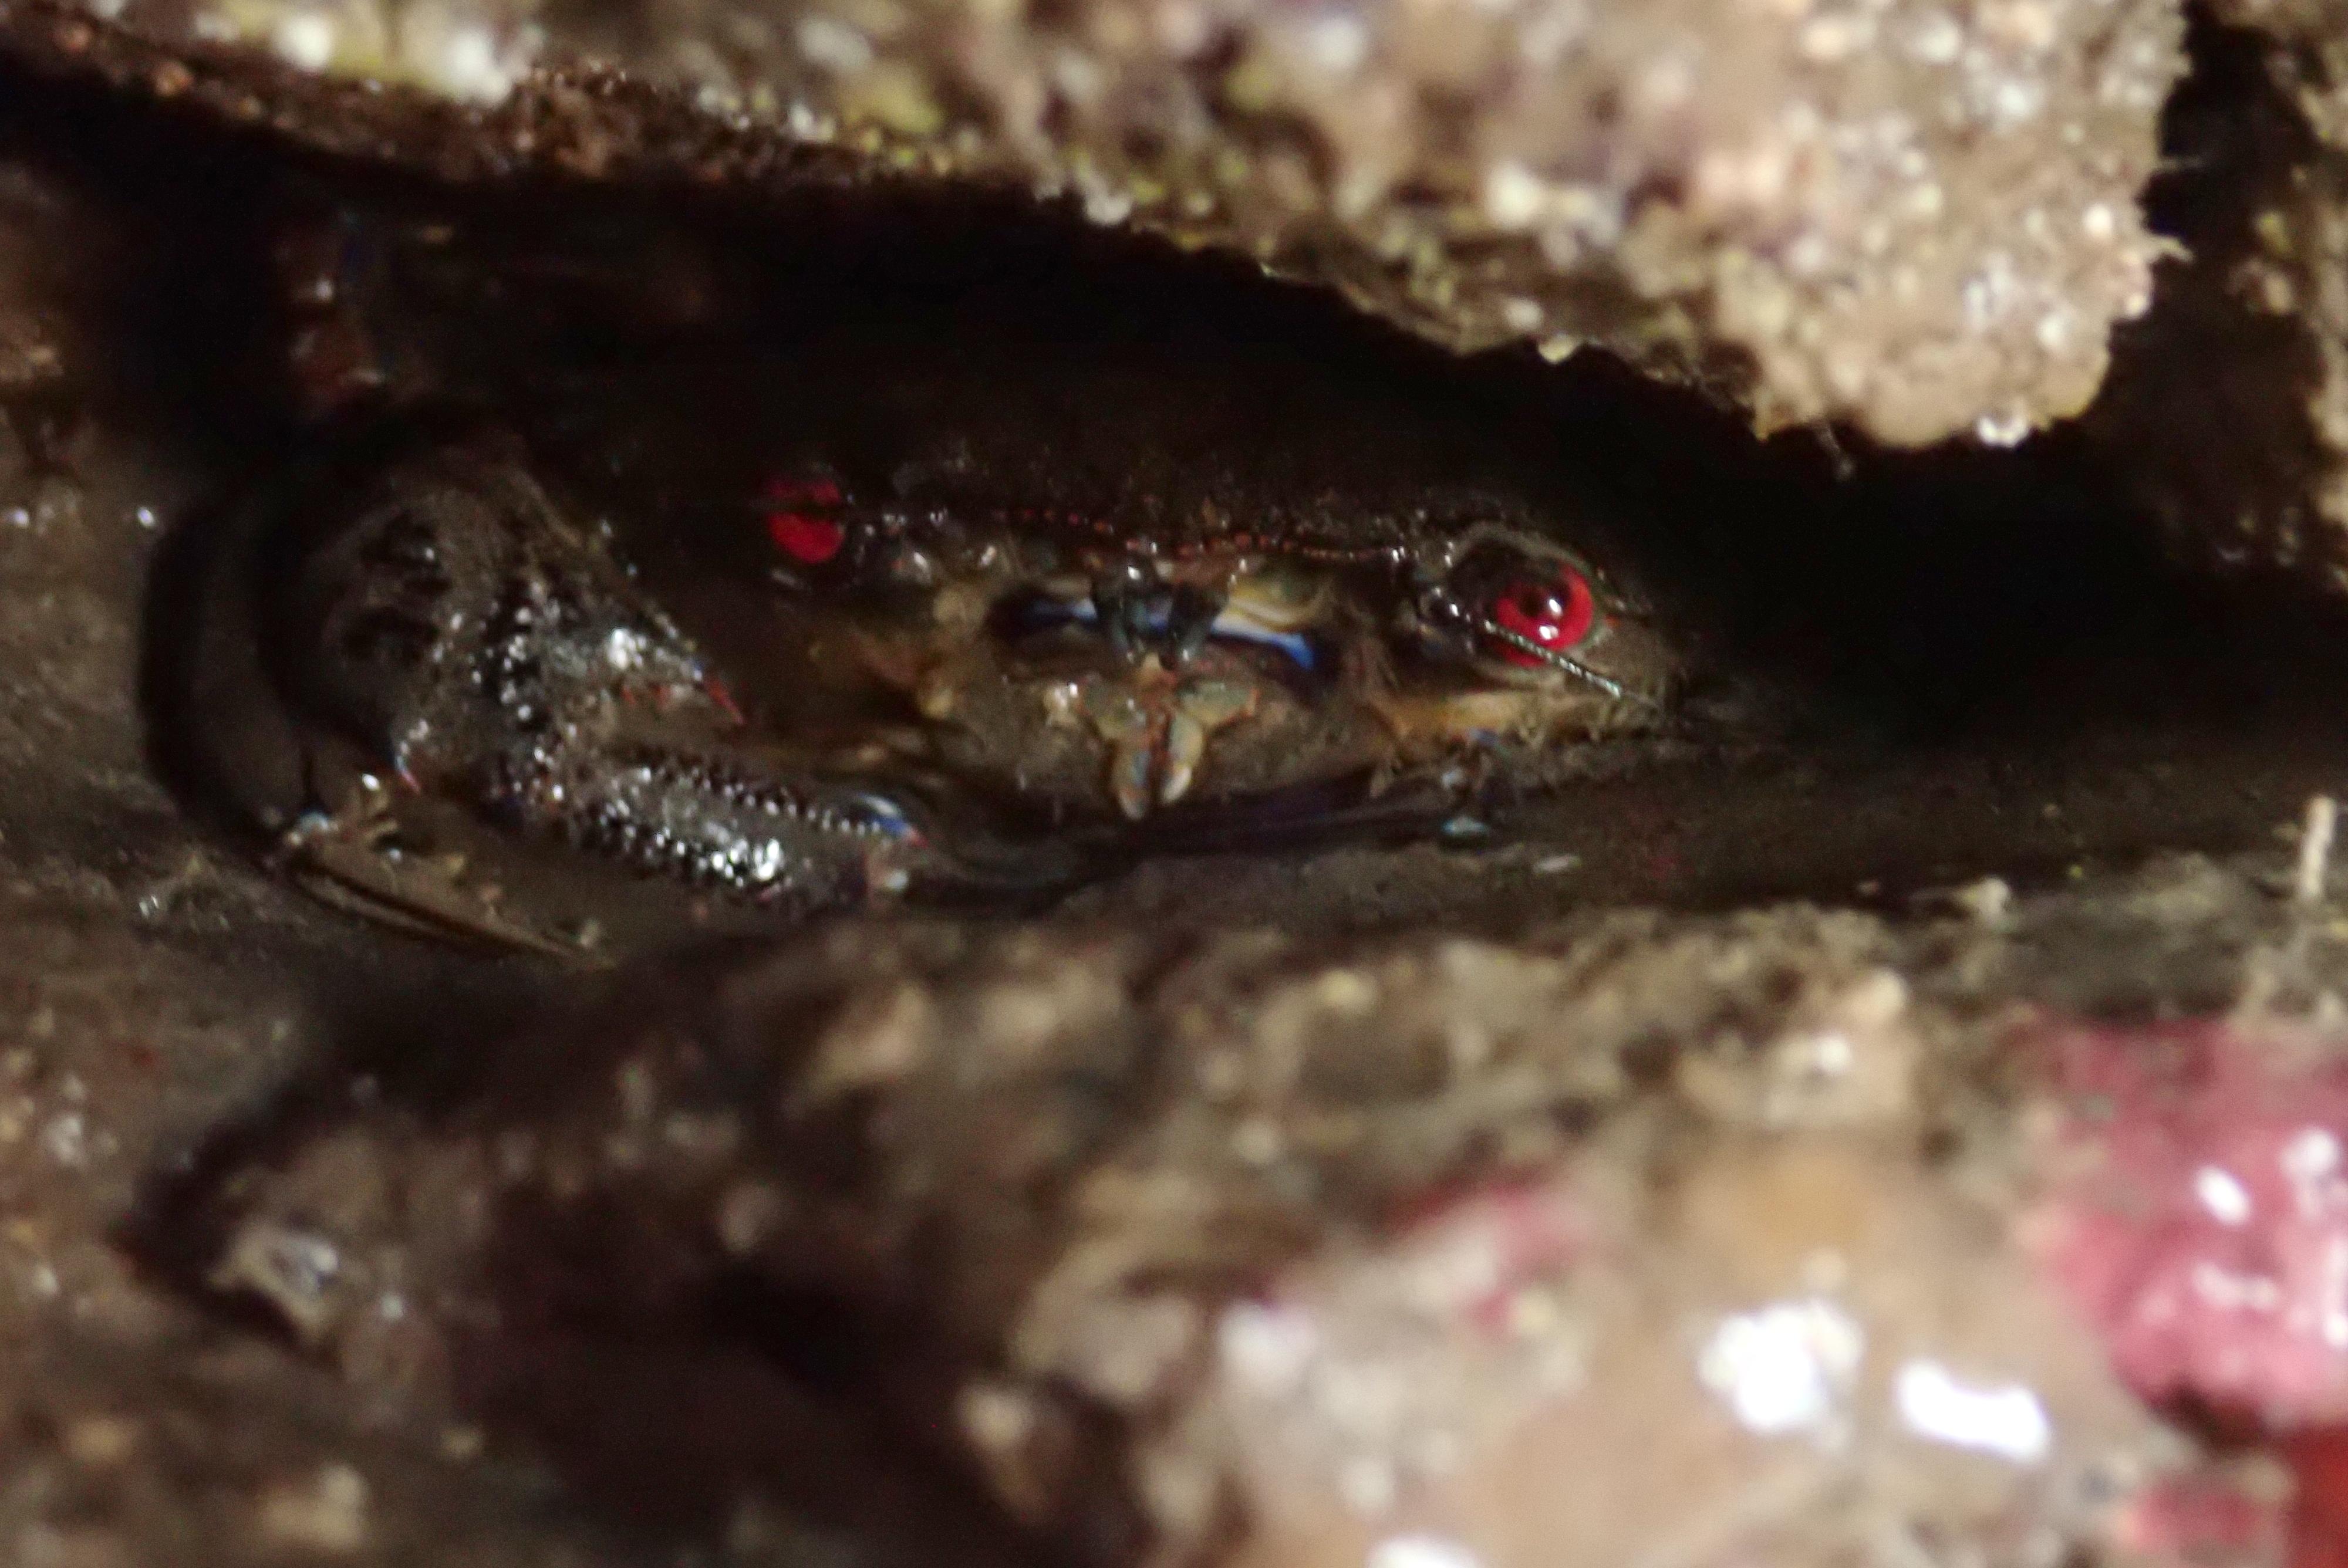 A Velvet swimming crab lurking under an overhang